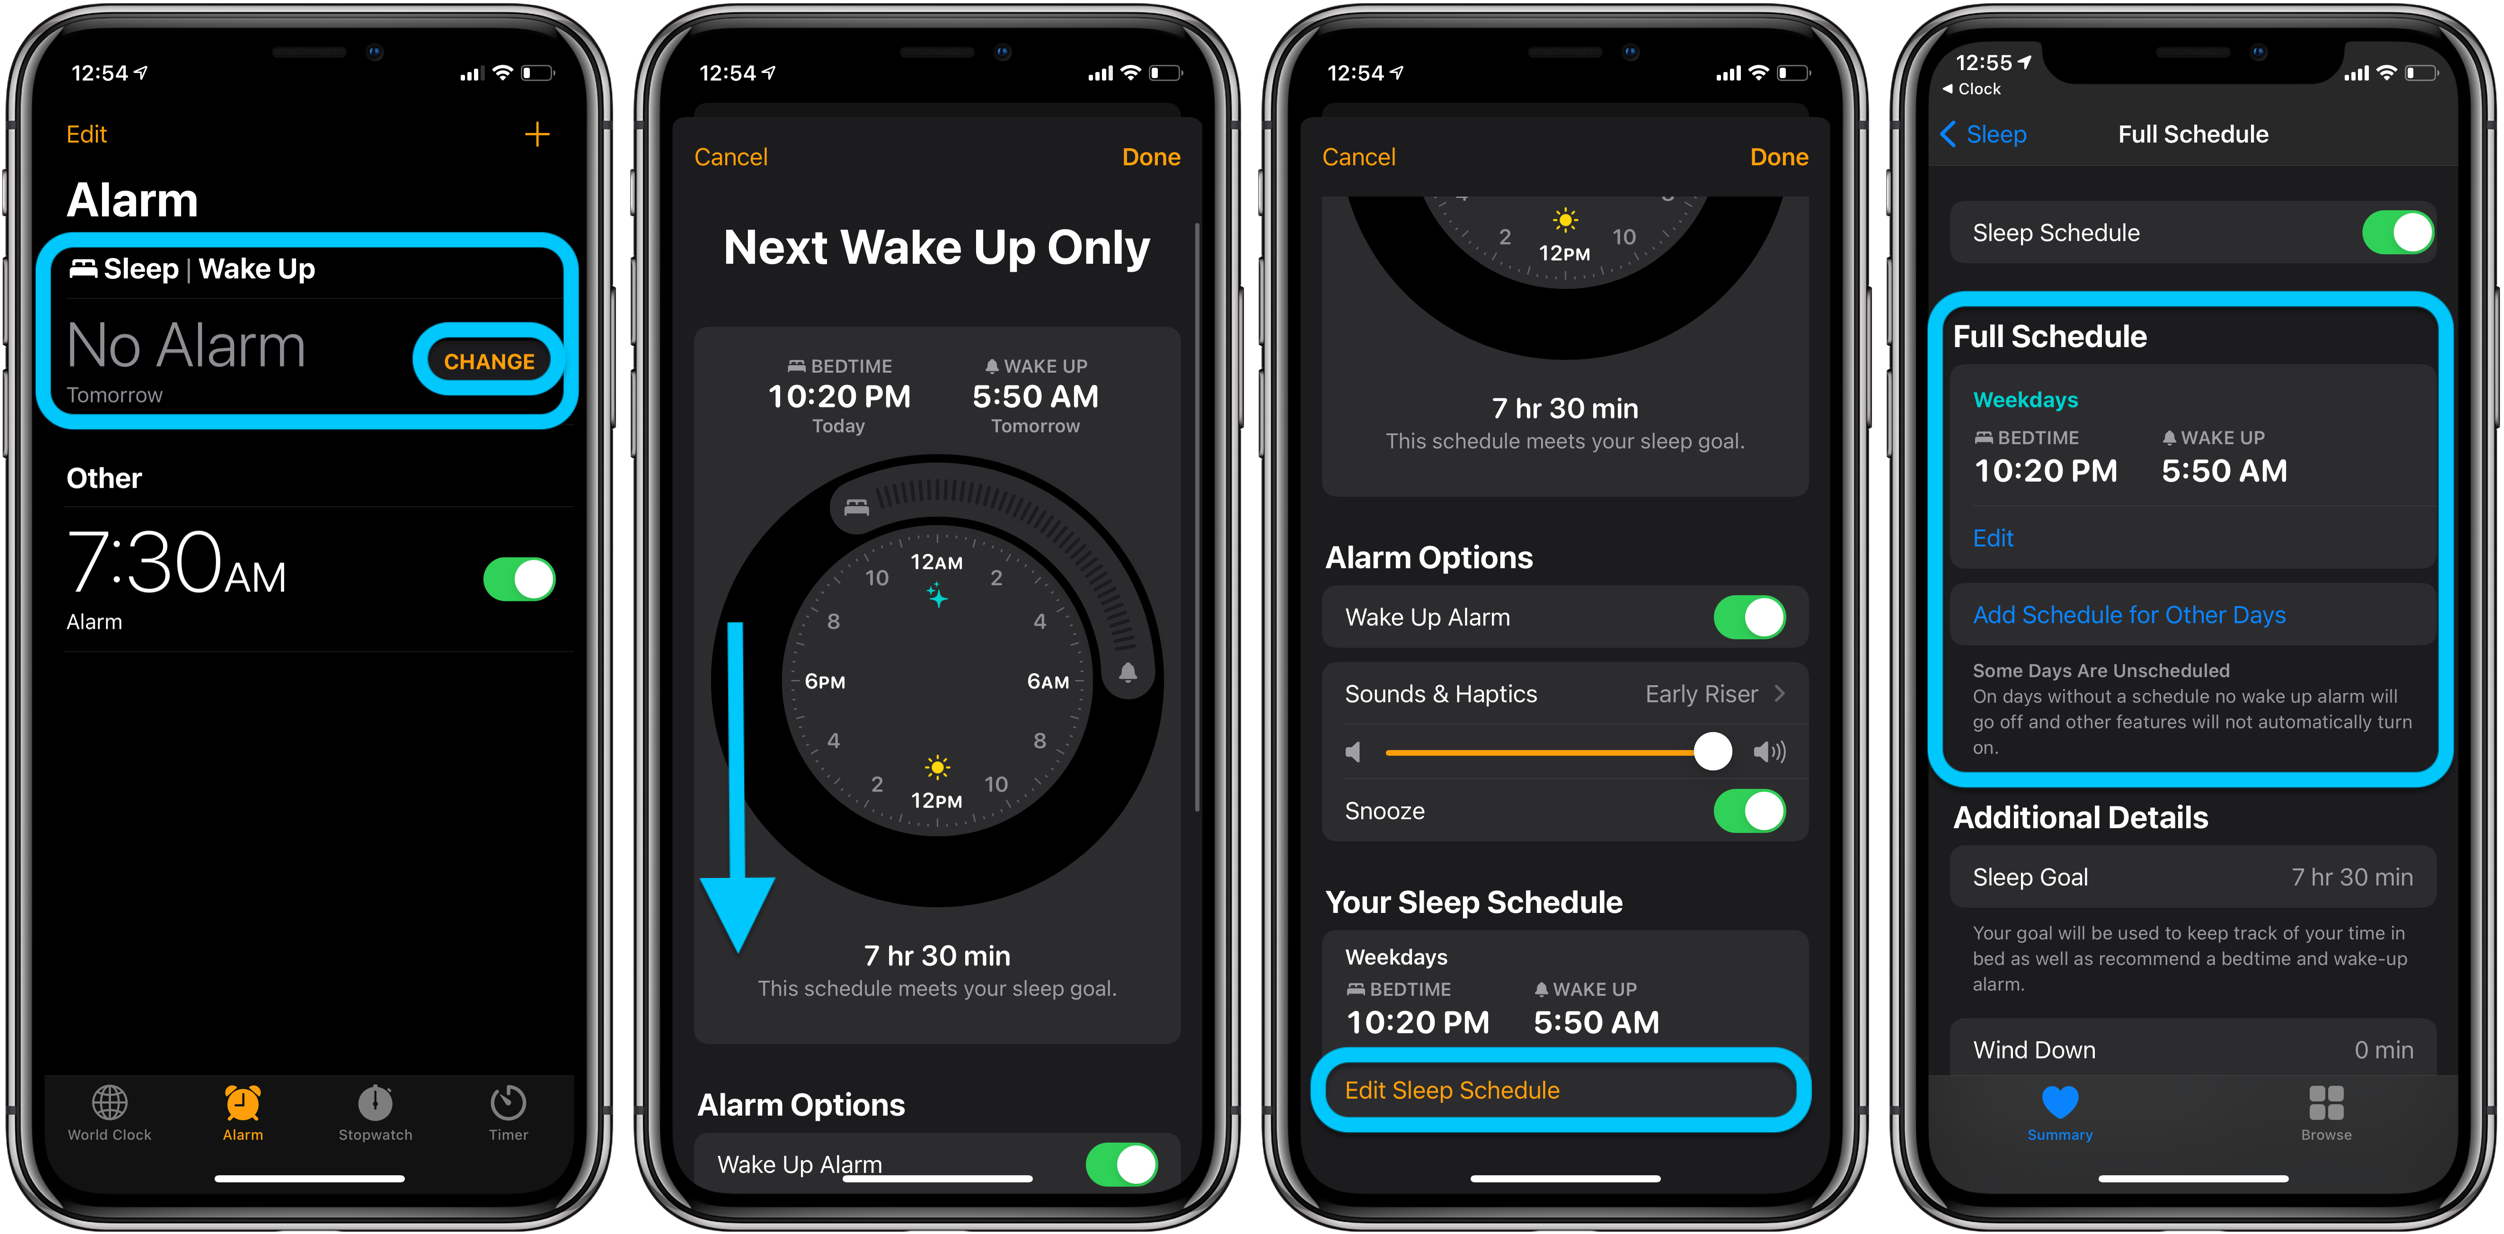 how-to-use-iphone-alarms-ios-14-walkthrough-2-1